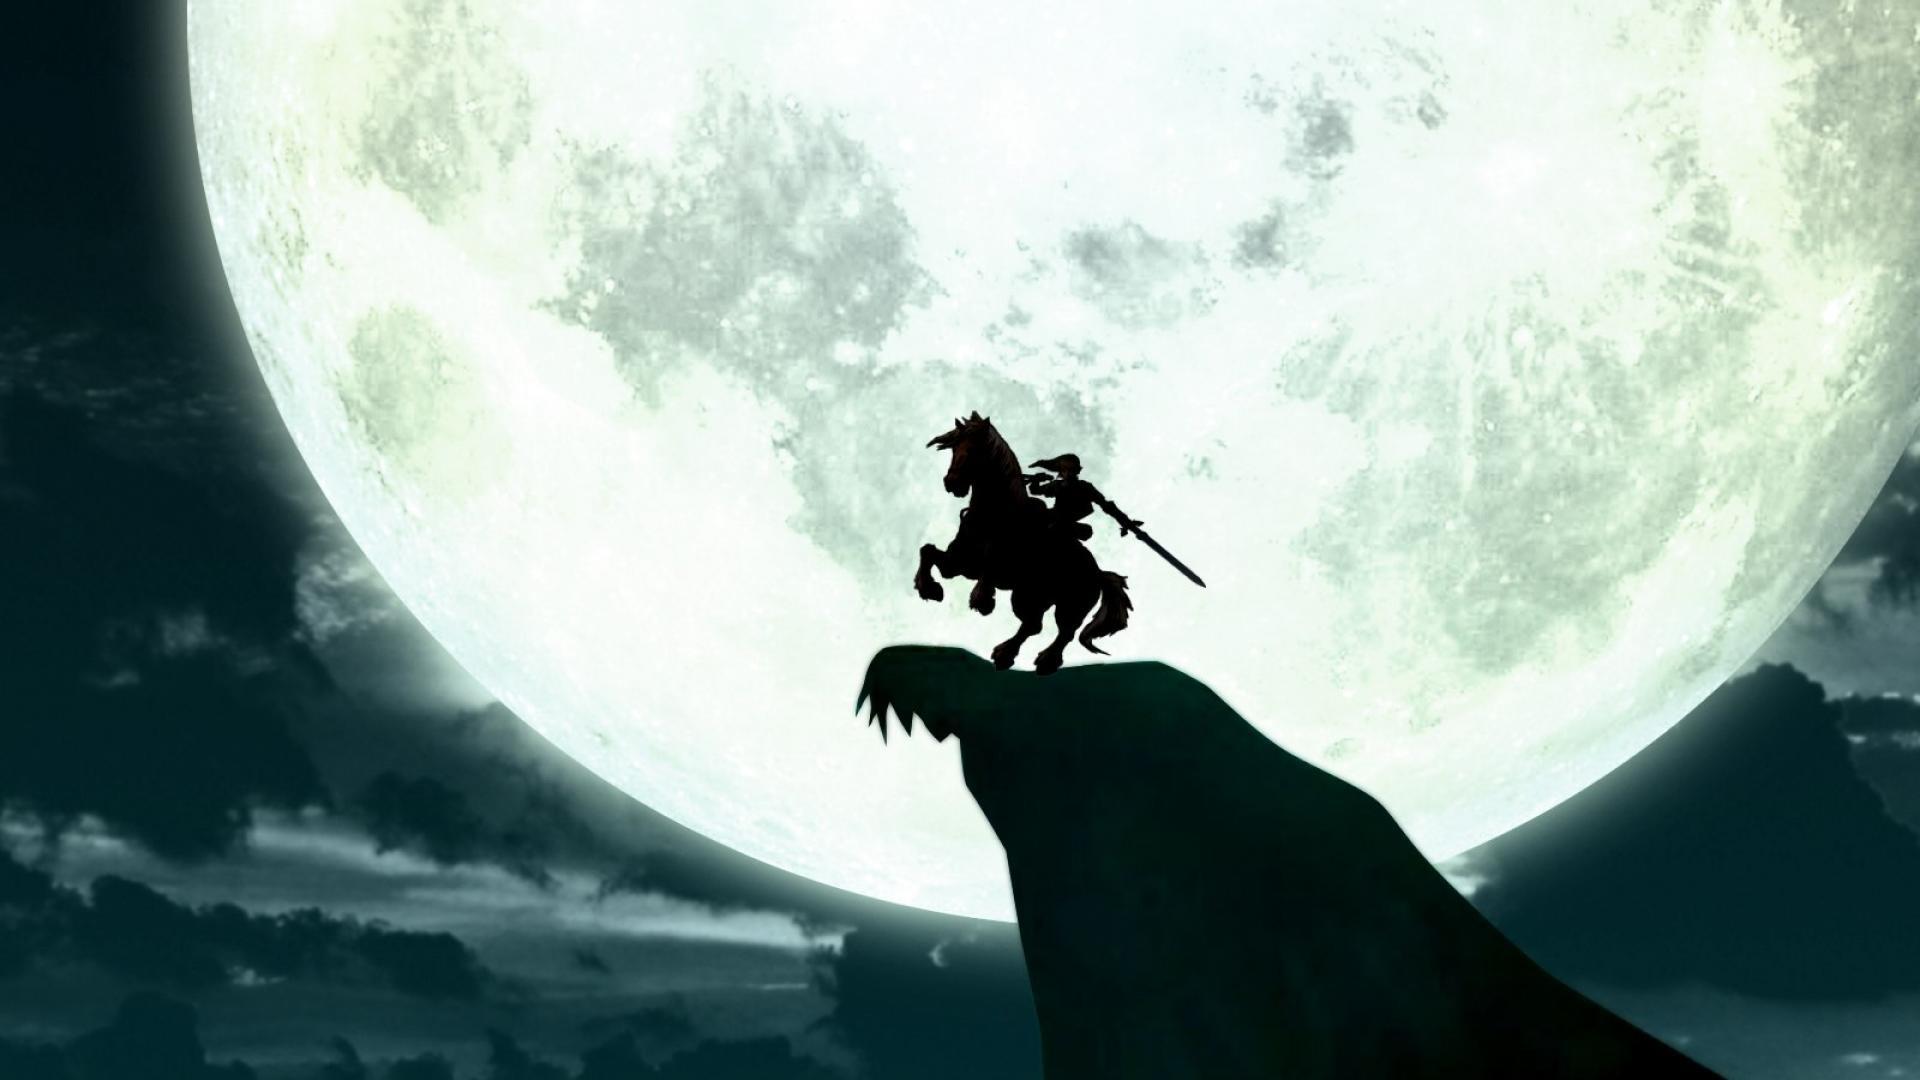 Res: 1920x1080, ... 1709299 Mobile Legend Of Zelda 4K Ultra HD Background Wallpapers -   ...